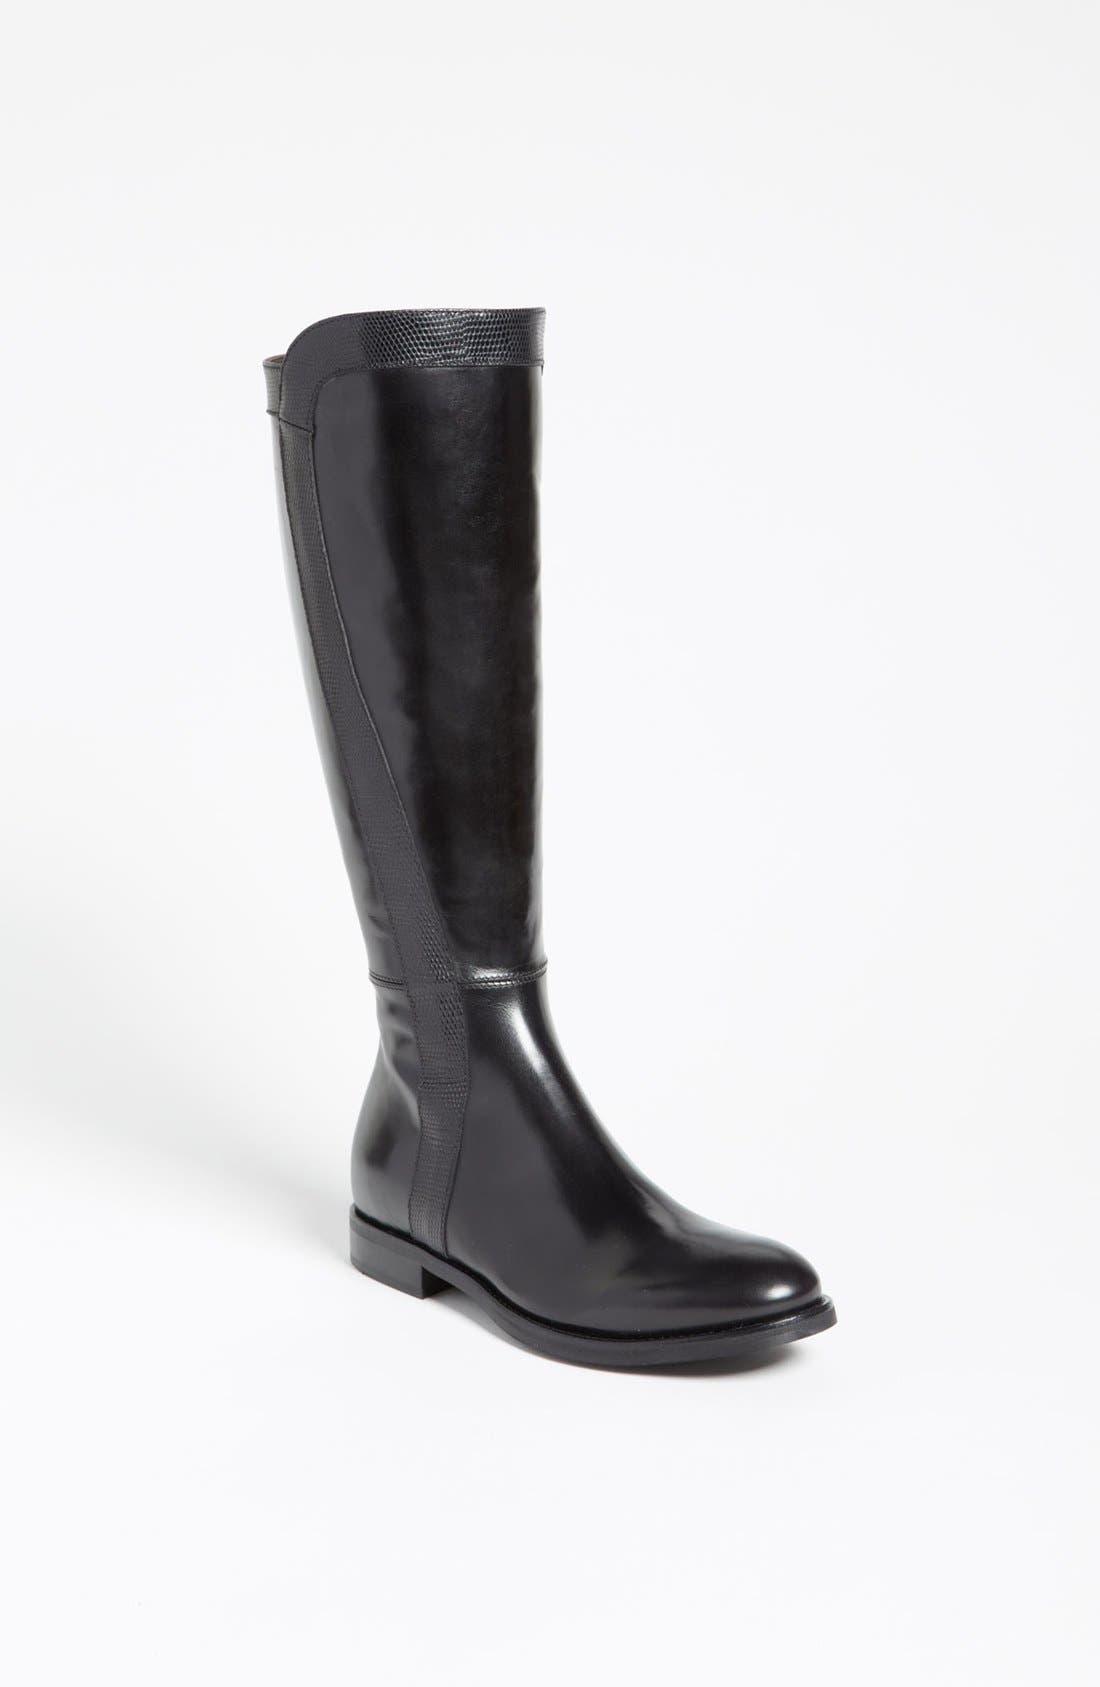 Alternate Image 1 Selected - Attilio Giusti Leombruni Tall Boot